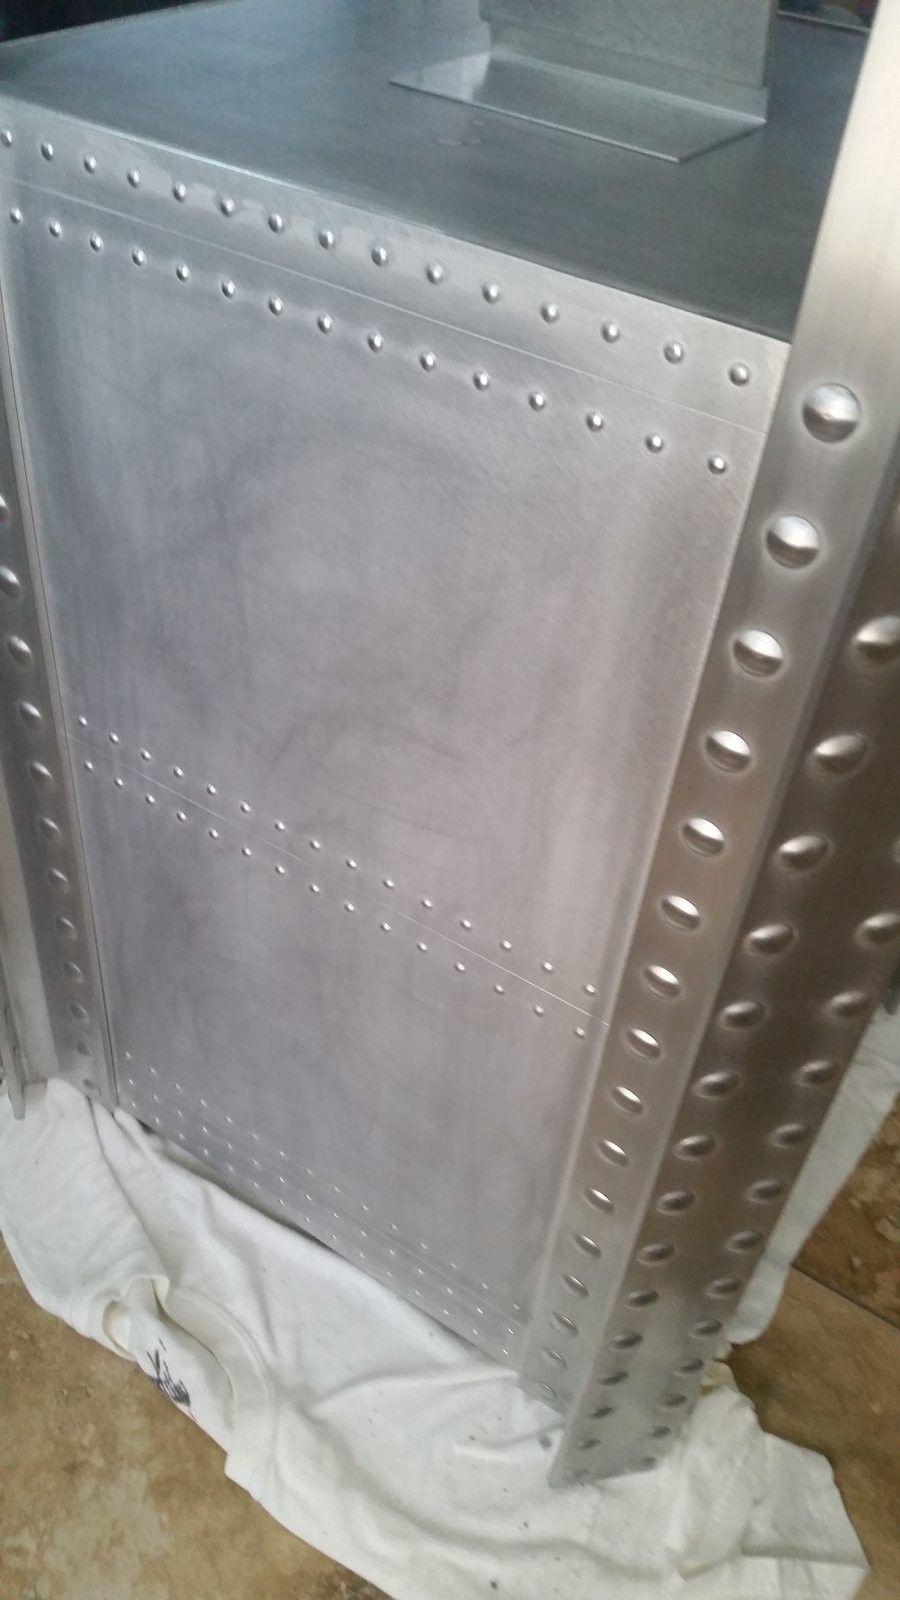 Aluminum Display Case - Polish Product Review - 20140906_170057.jpg